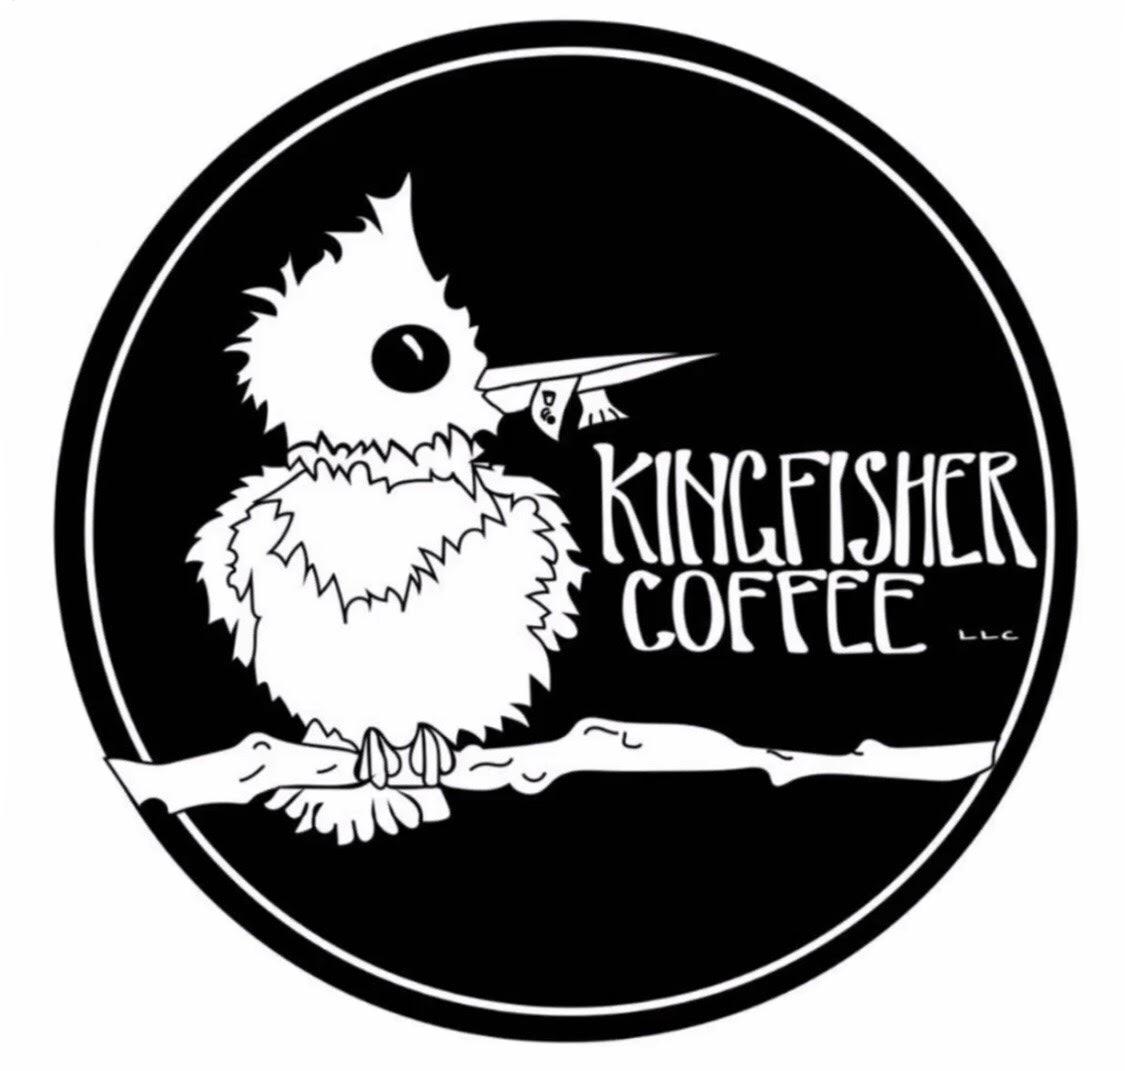 kingfisher coffee logo.jpg